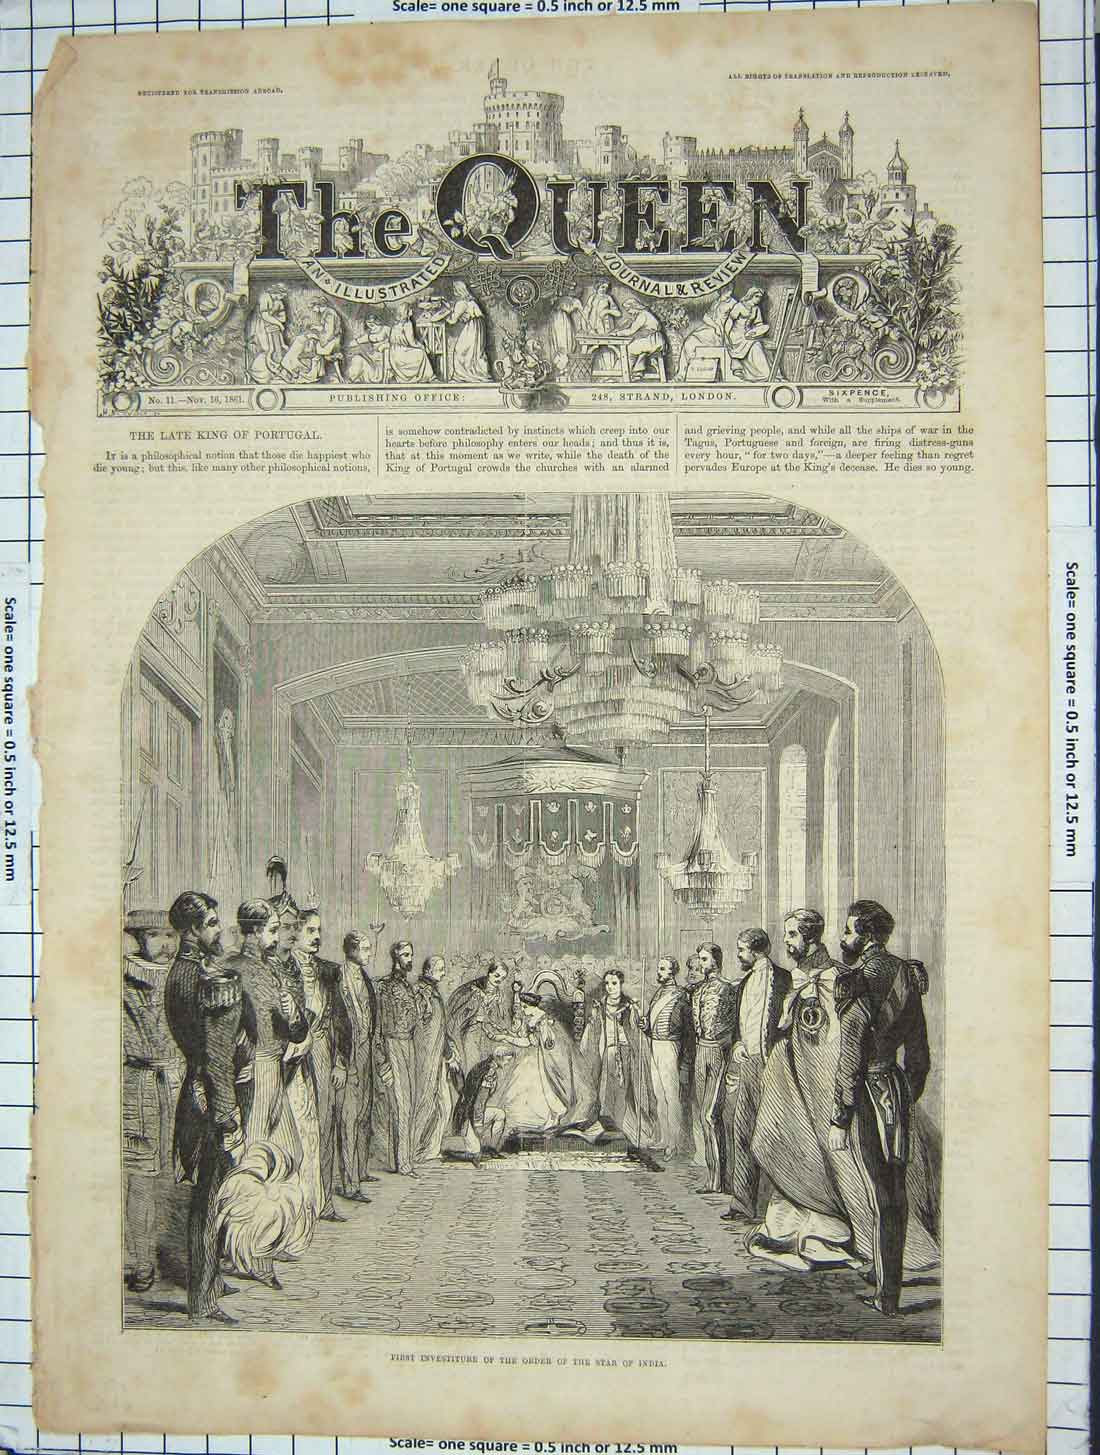 http://www.columbia.edu/itc/mealac/pritchett/00routesdata/1800_1899/britishrule/victoria/queen1861.jpg